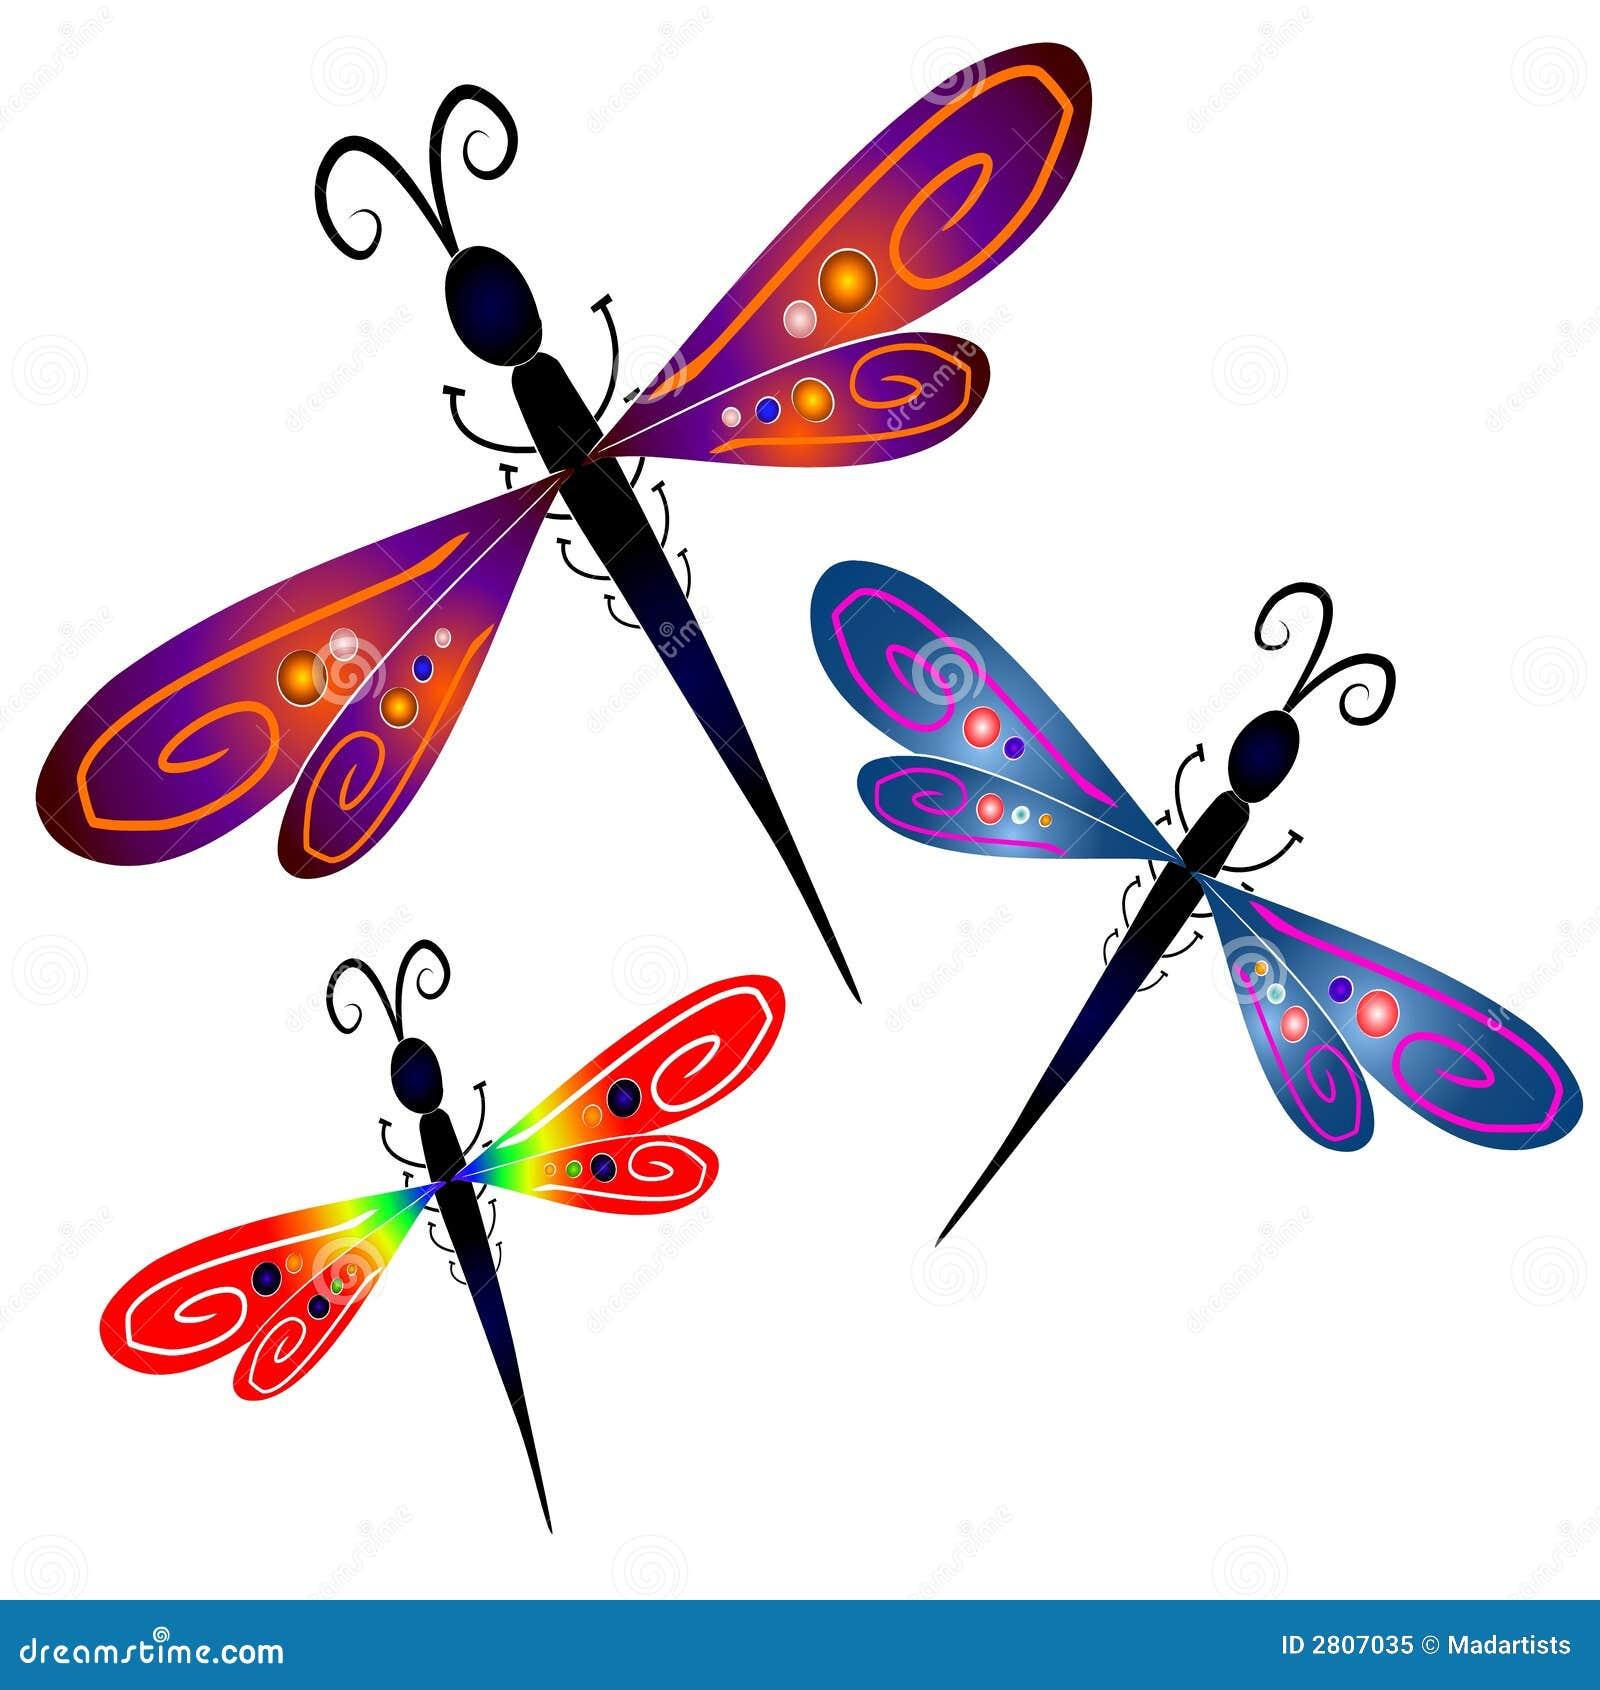 clipart  images graphiques  abstrait de libellule clip art dragonfly outline only clip art dragonfly black and white